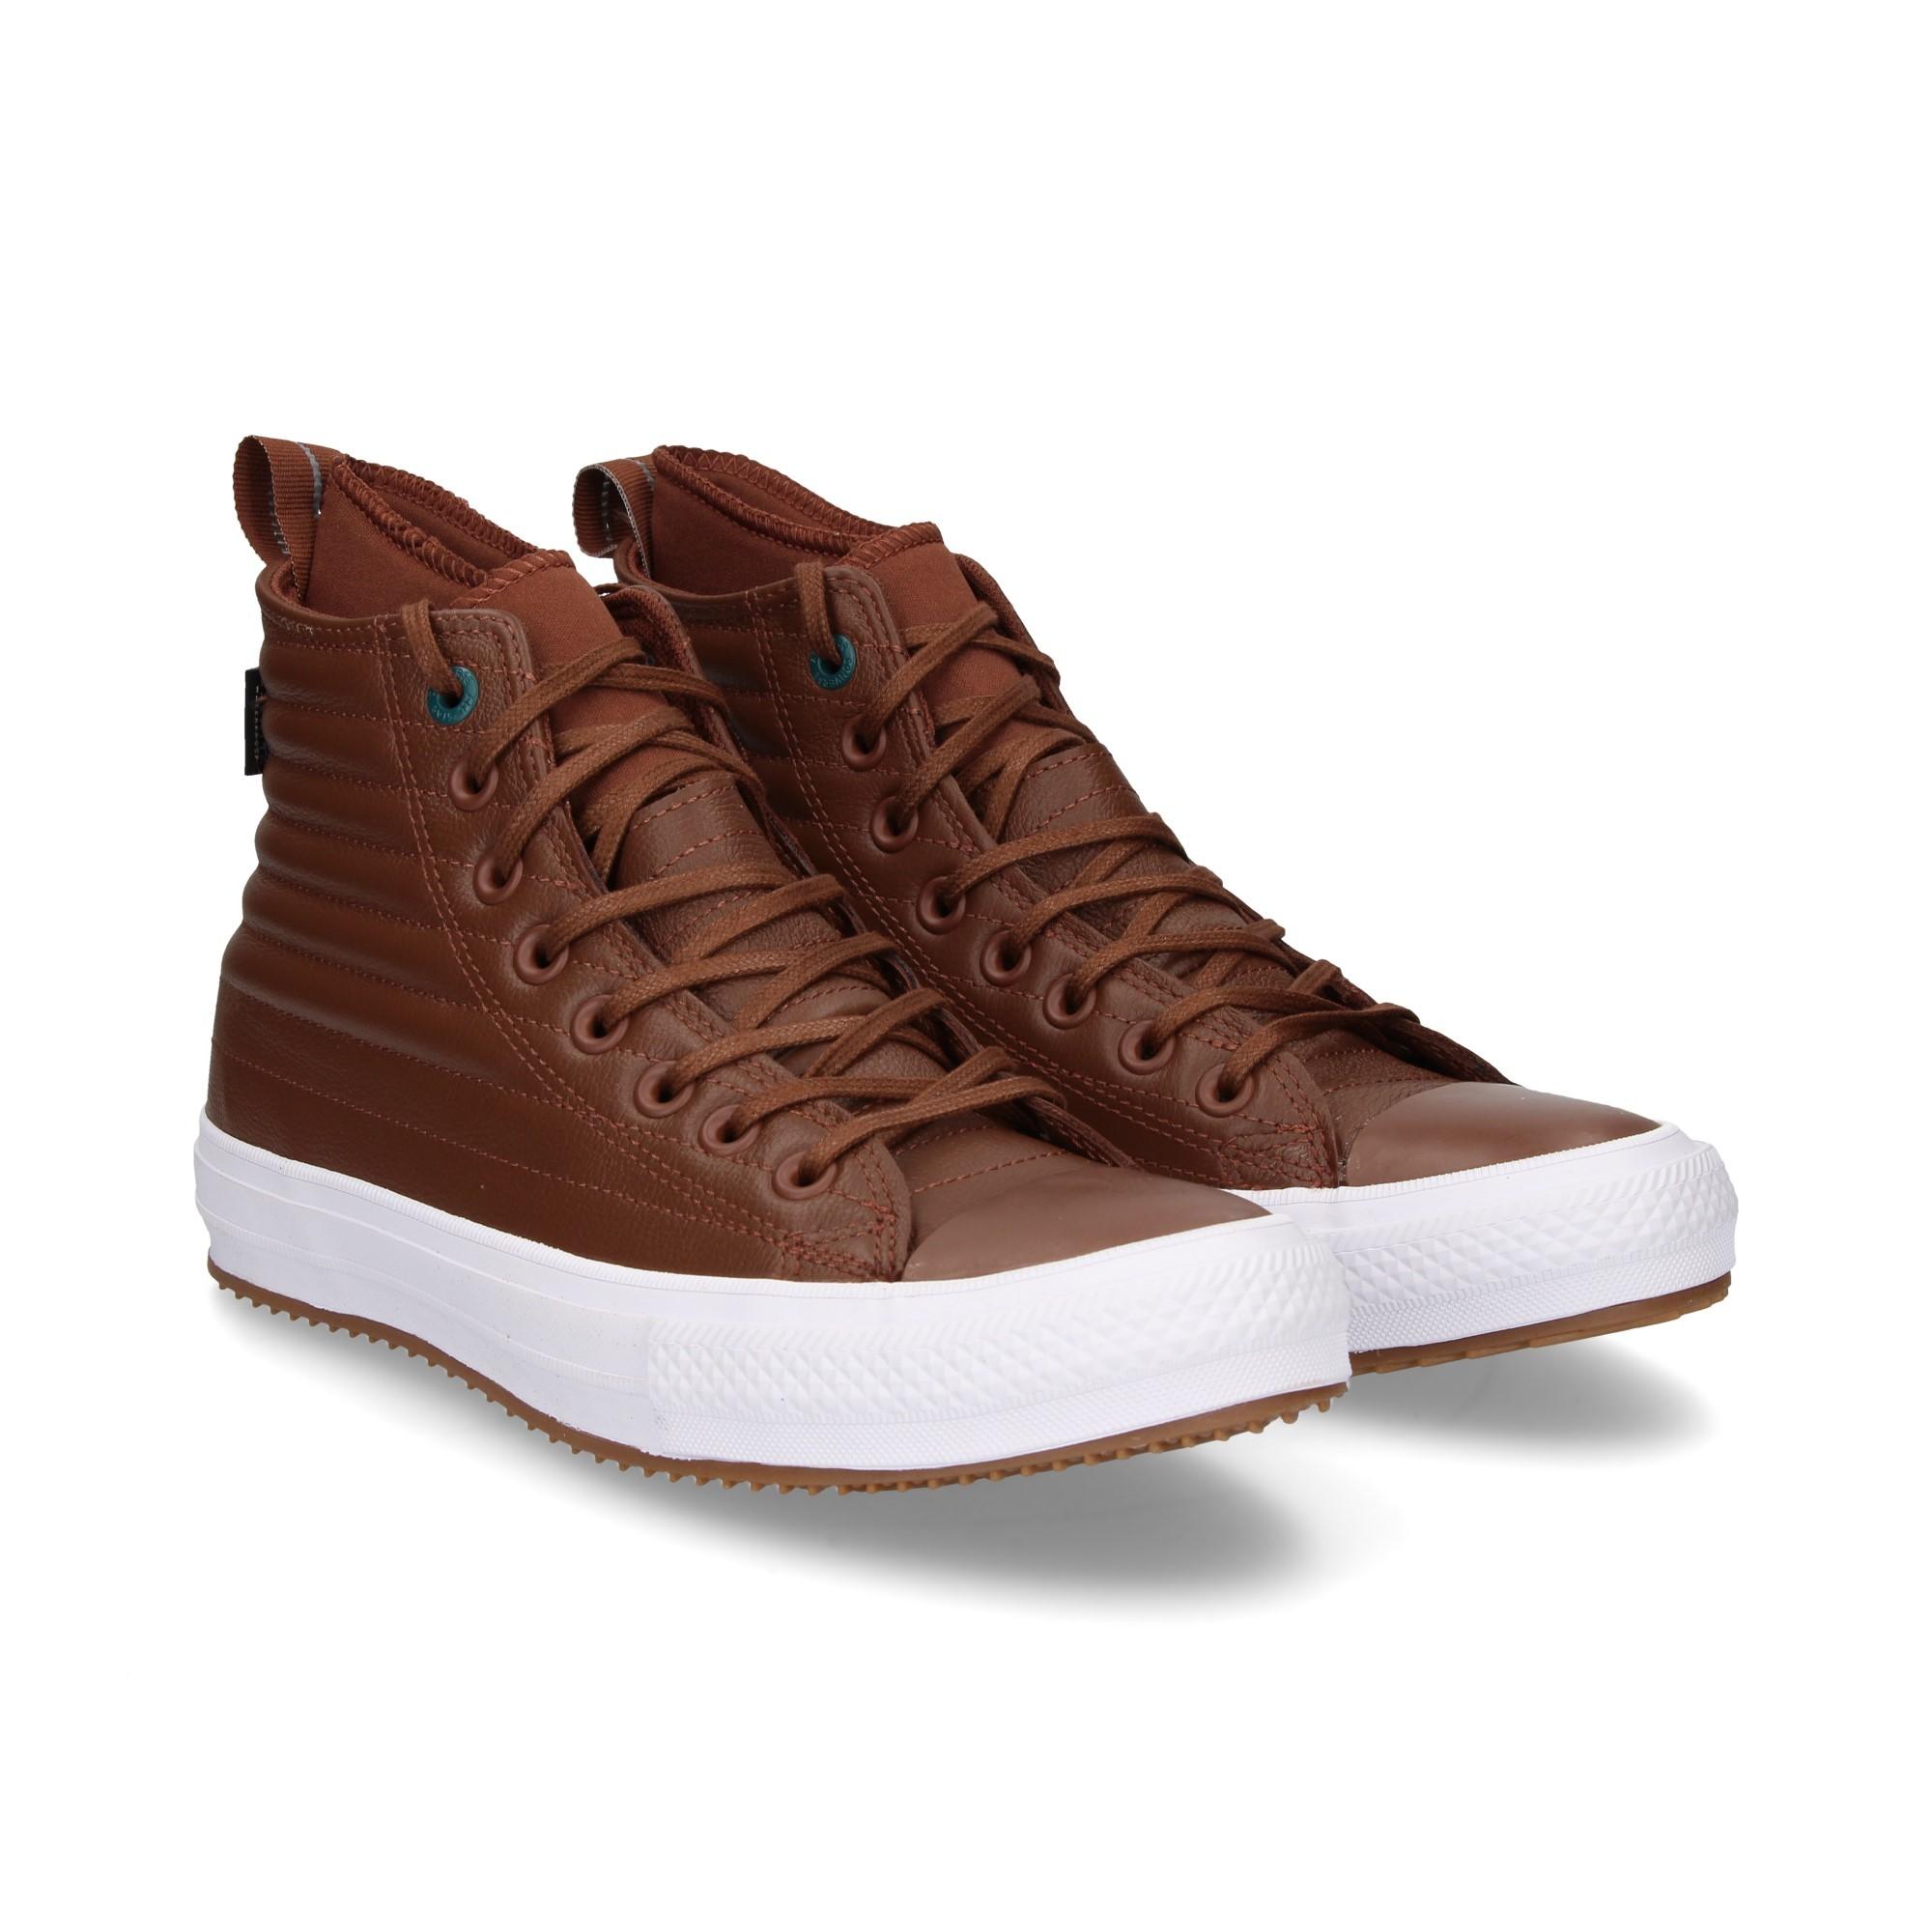 4ecdd90d6 CONVERSE Men s sneakers CONVERSE157491C MARRON